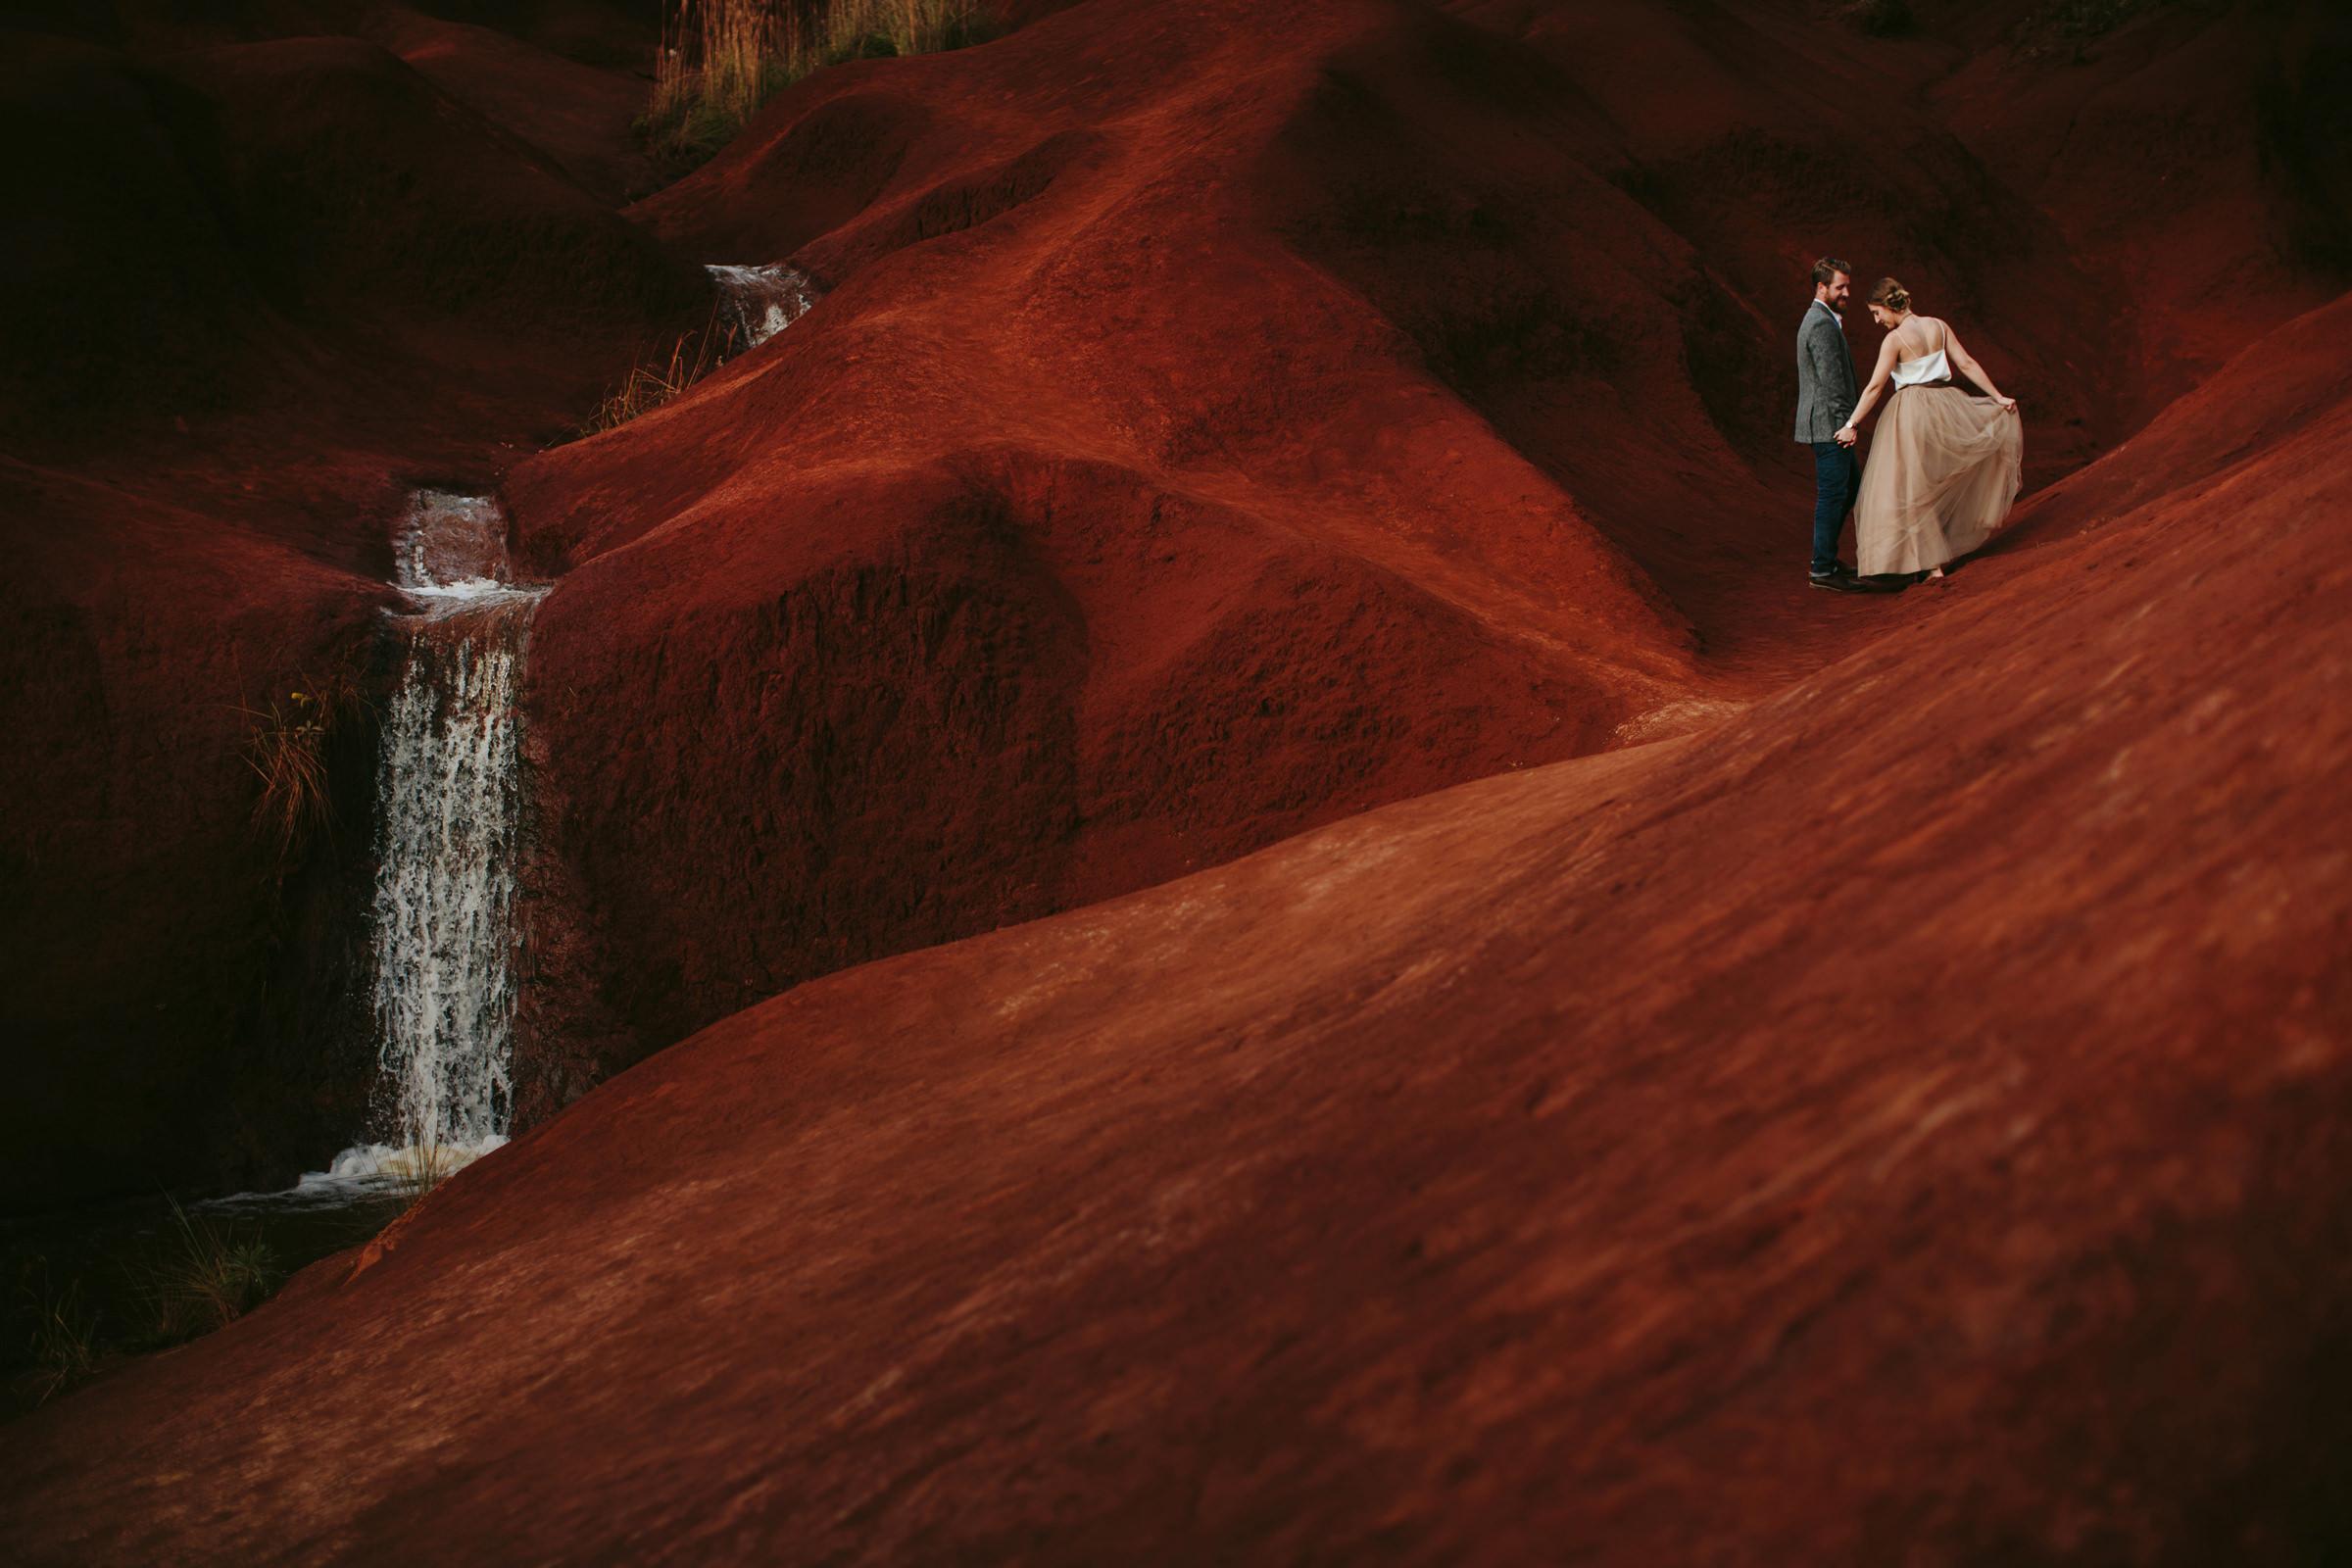 Engagement photo at Maui waterfall - photo by Melia Lucida